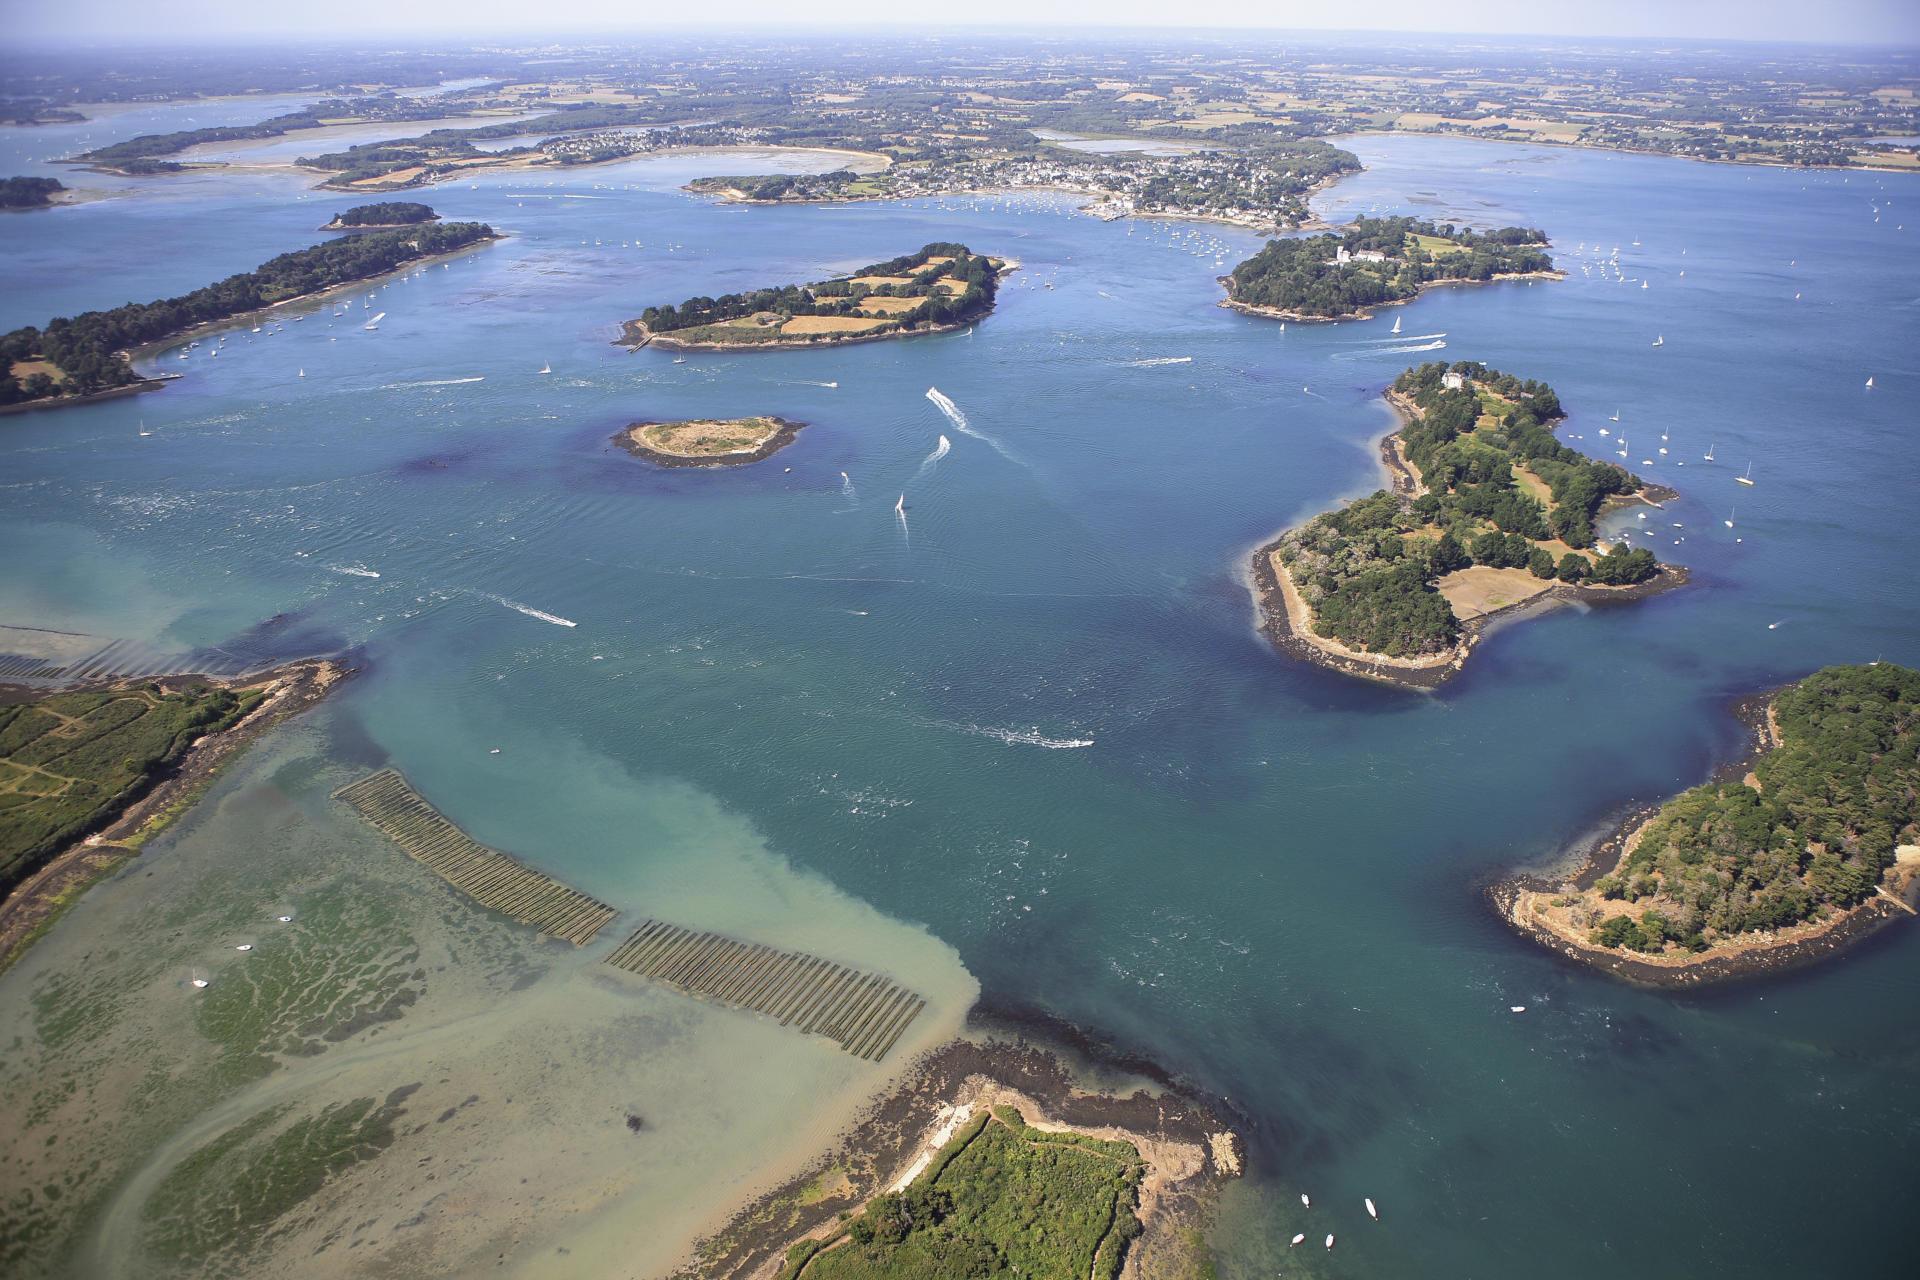 Vue aerienne du golfe du Morbihan